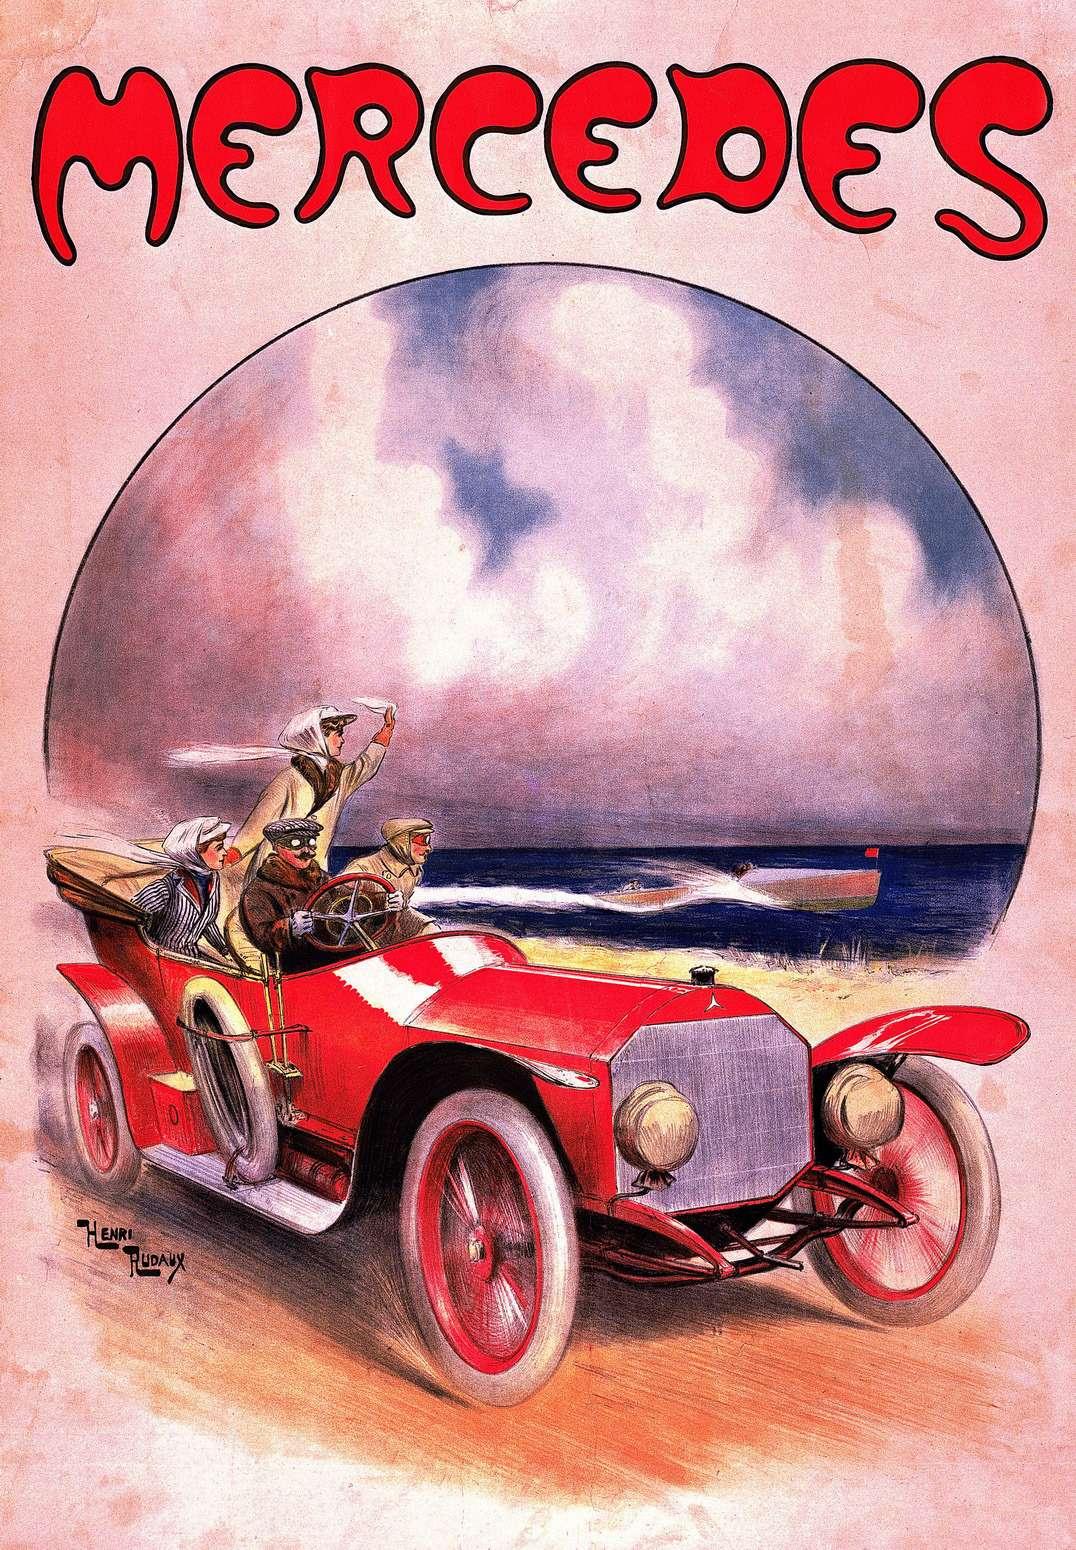 …иDaimler (Mercedes 14/30PS напостере Энри Рудо 1910 года)